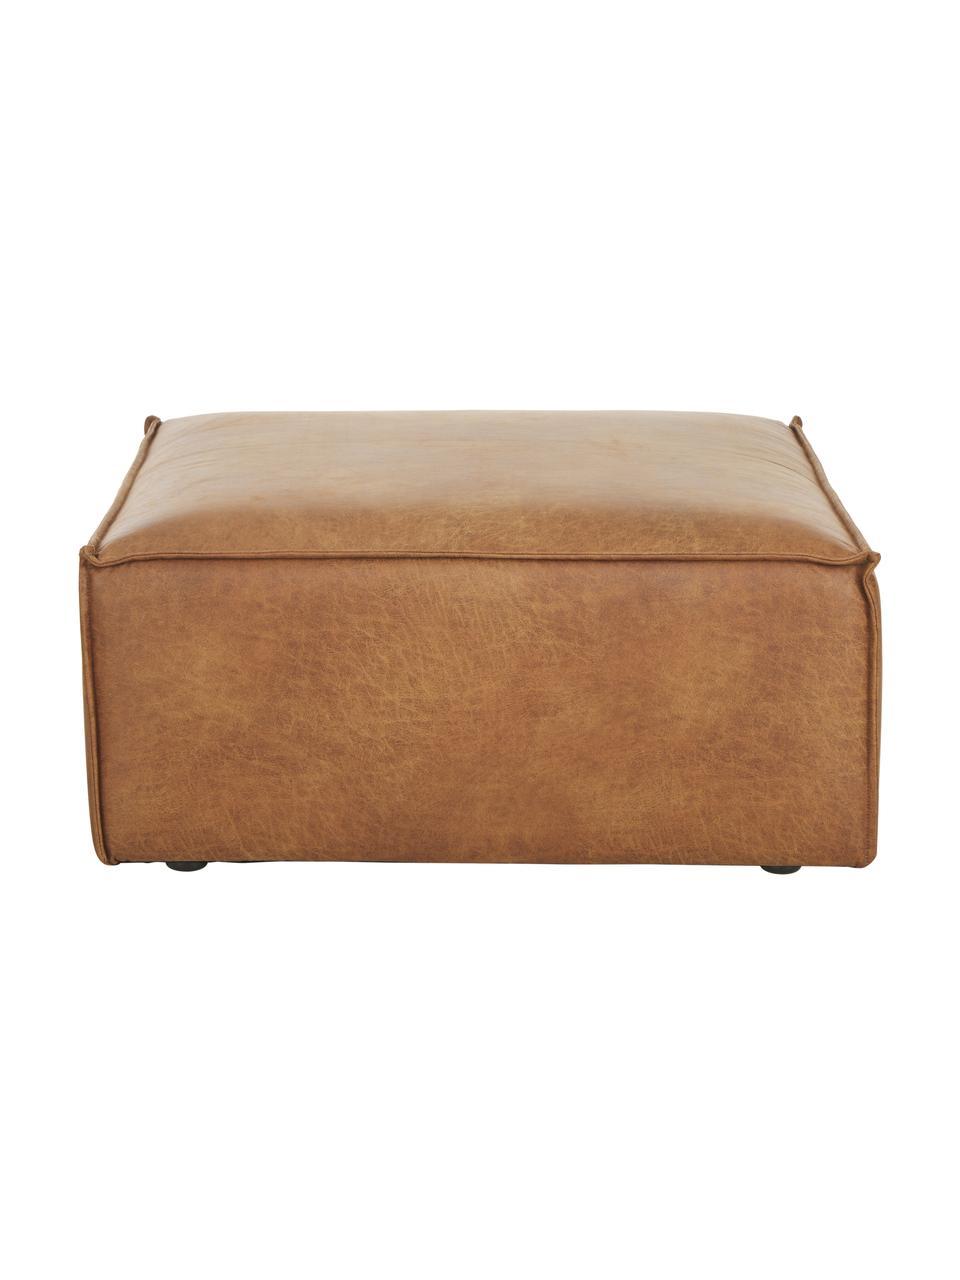 Sofa-Hocker Lennon in Braun aus recyceltem Leder, Bezug: Recyceltes Leder (70% Led, Gestell: Massives Kiefernholz, Spe, Füße: Kunststoff Die Füße befin, Leder Braun, 88 x 43 cm